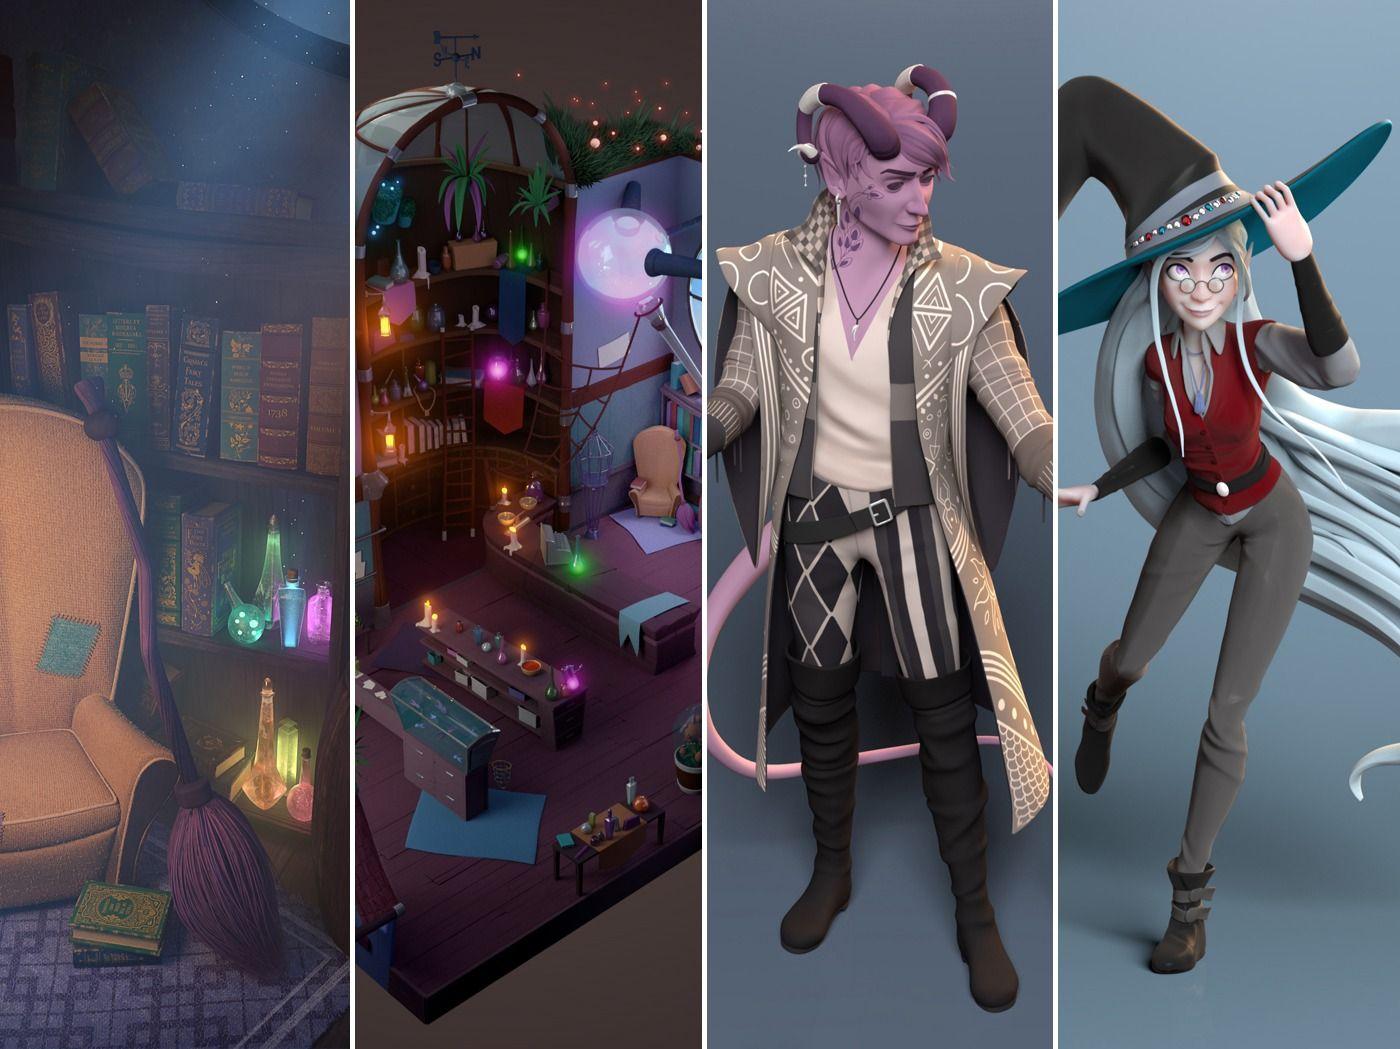 3D Characters and Environment - Diana Sousa